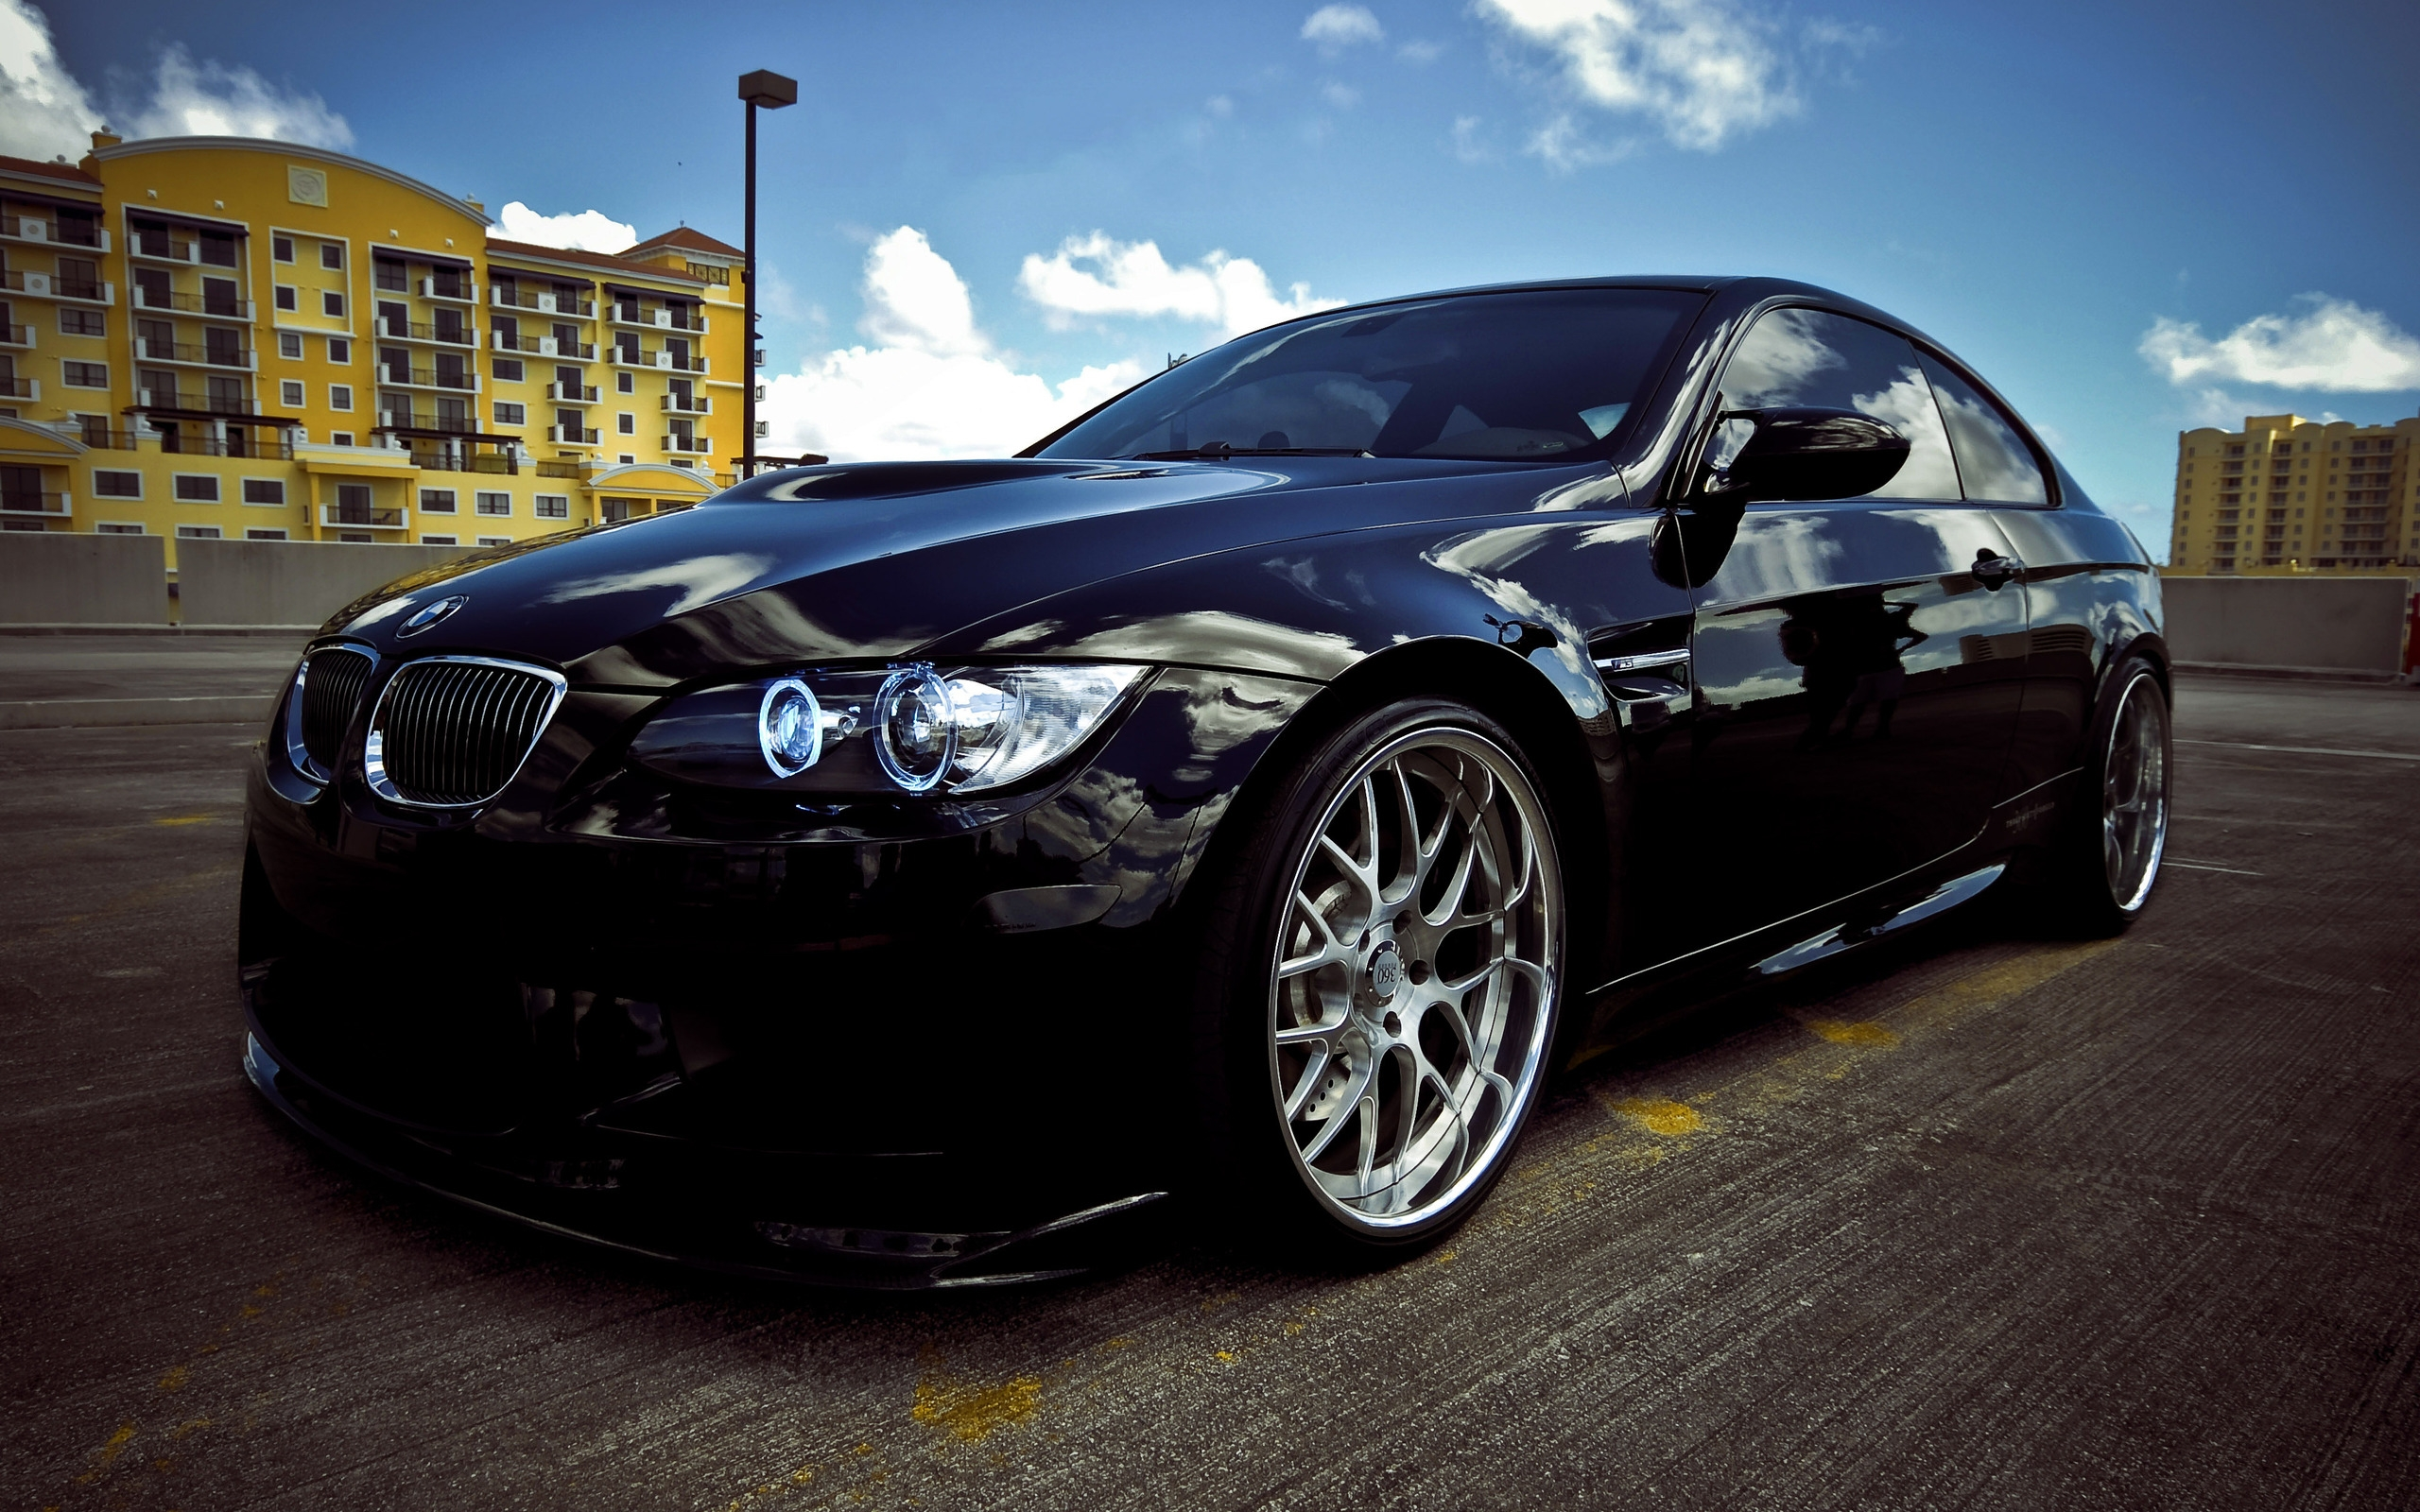 BMW M3 Dark Black